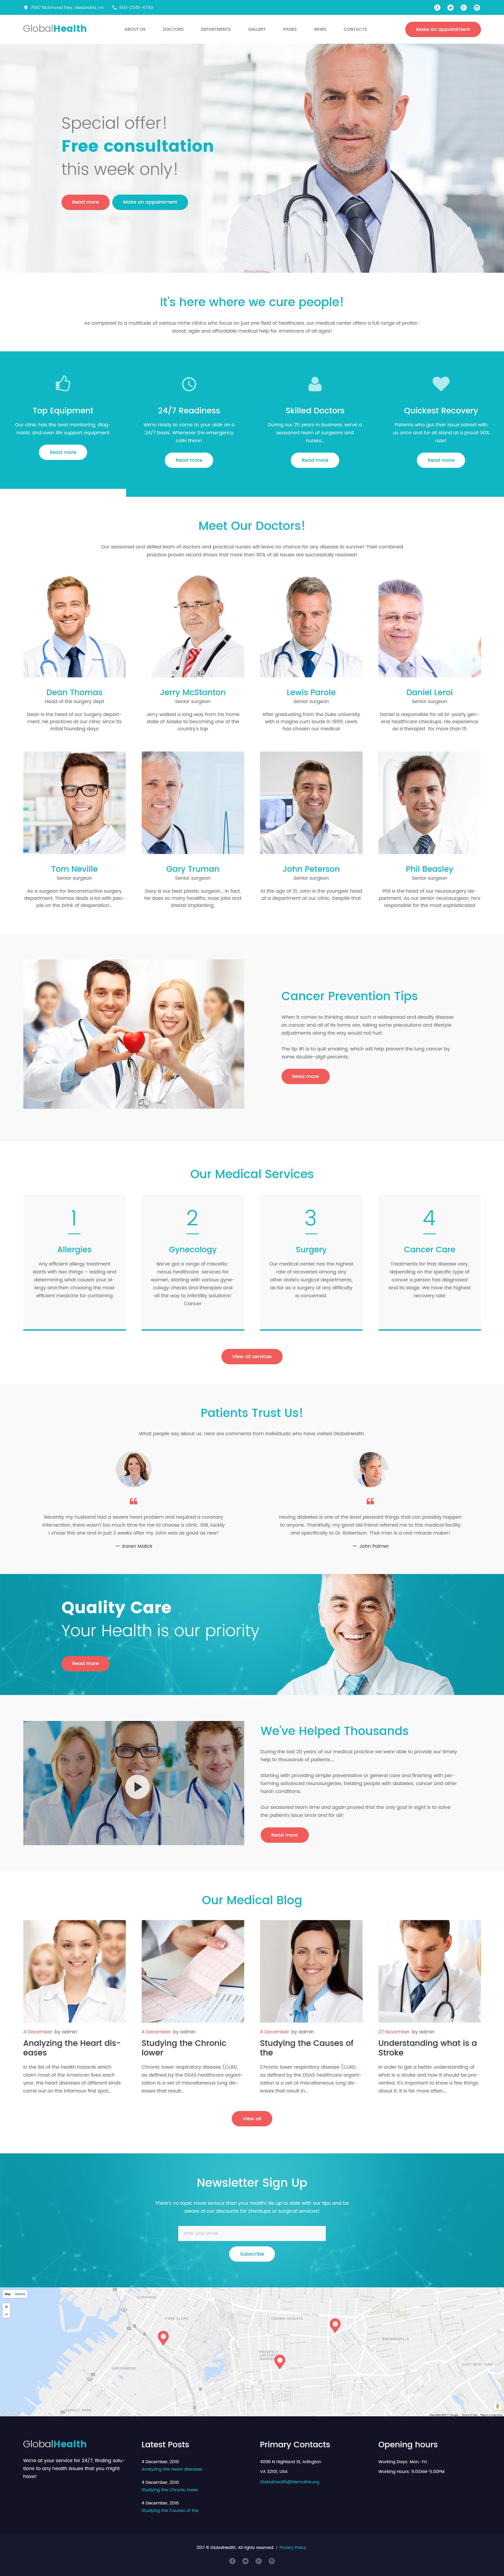 """GlobalHealth - Doctor & Medical"" - адаптивний WordPress шаблон №61240"